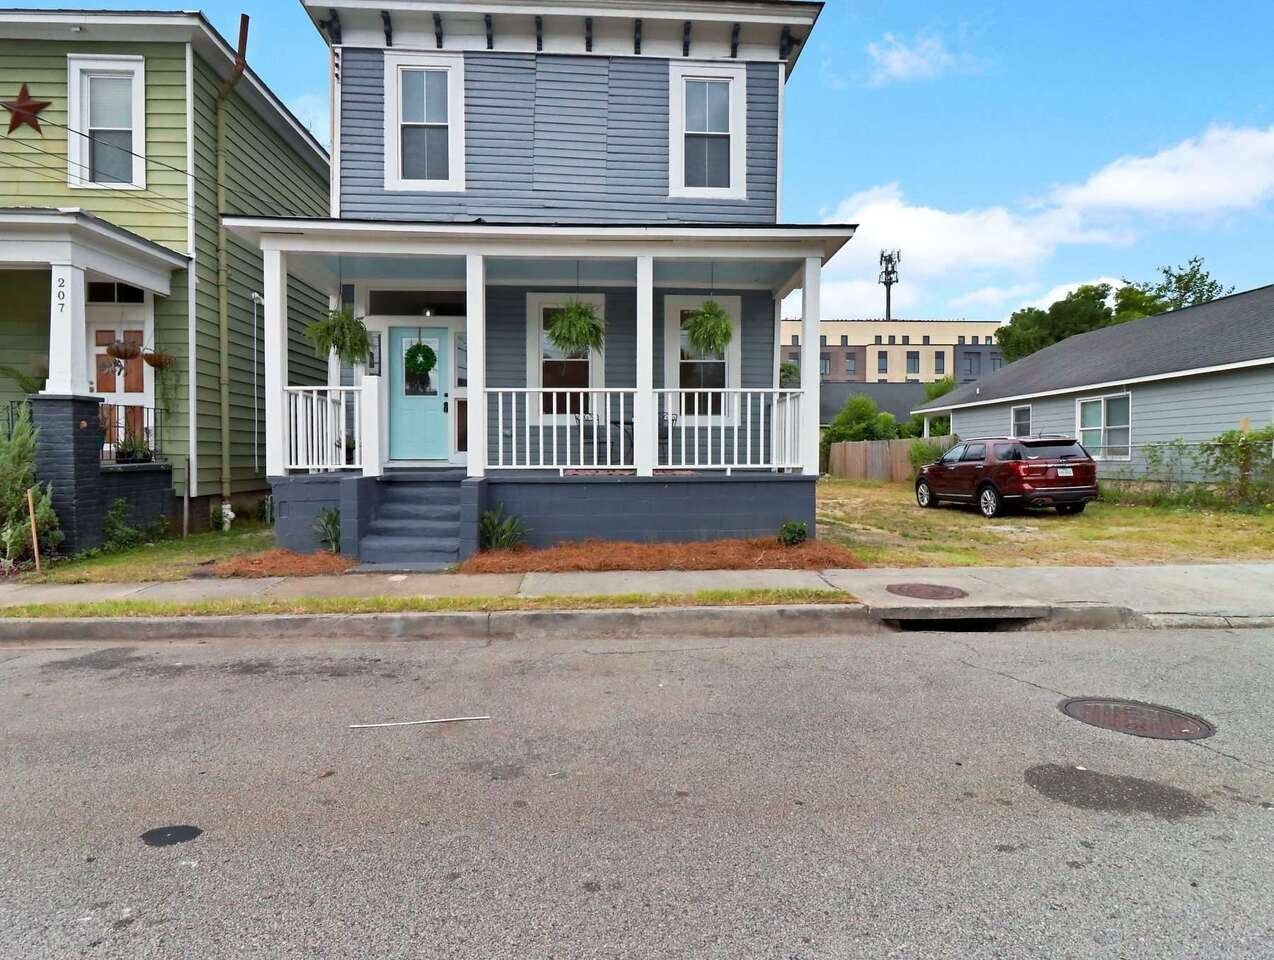 209 W 43Rd, Savannah, GA 31401 - MLS#: 8837296